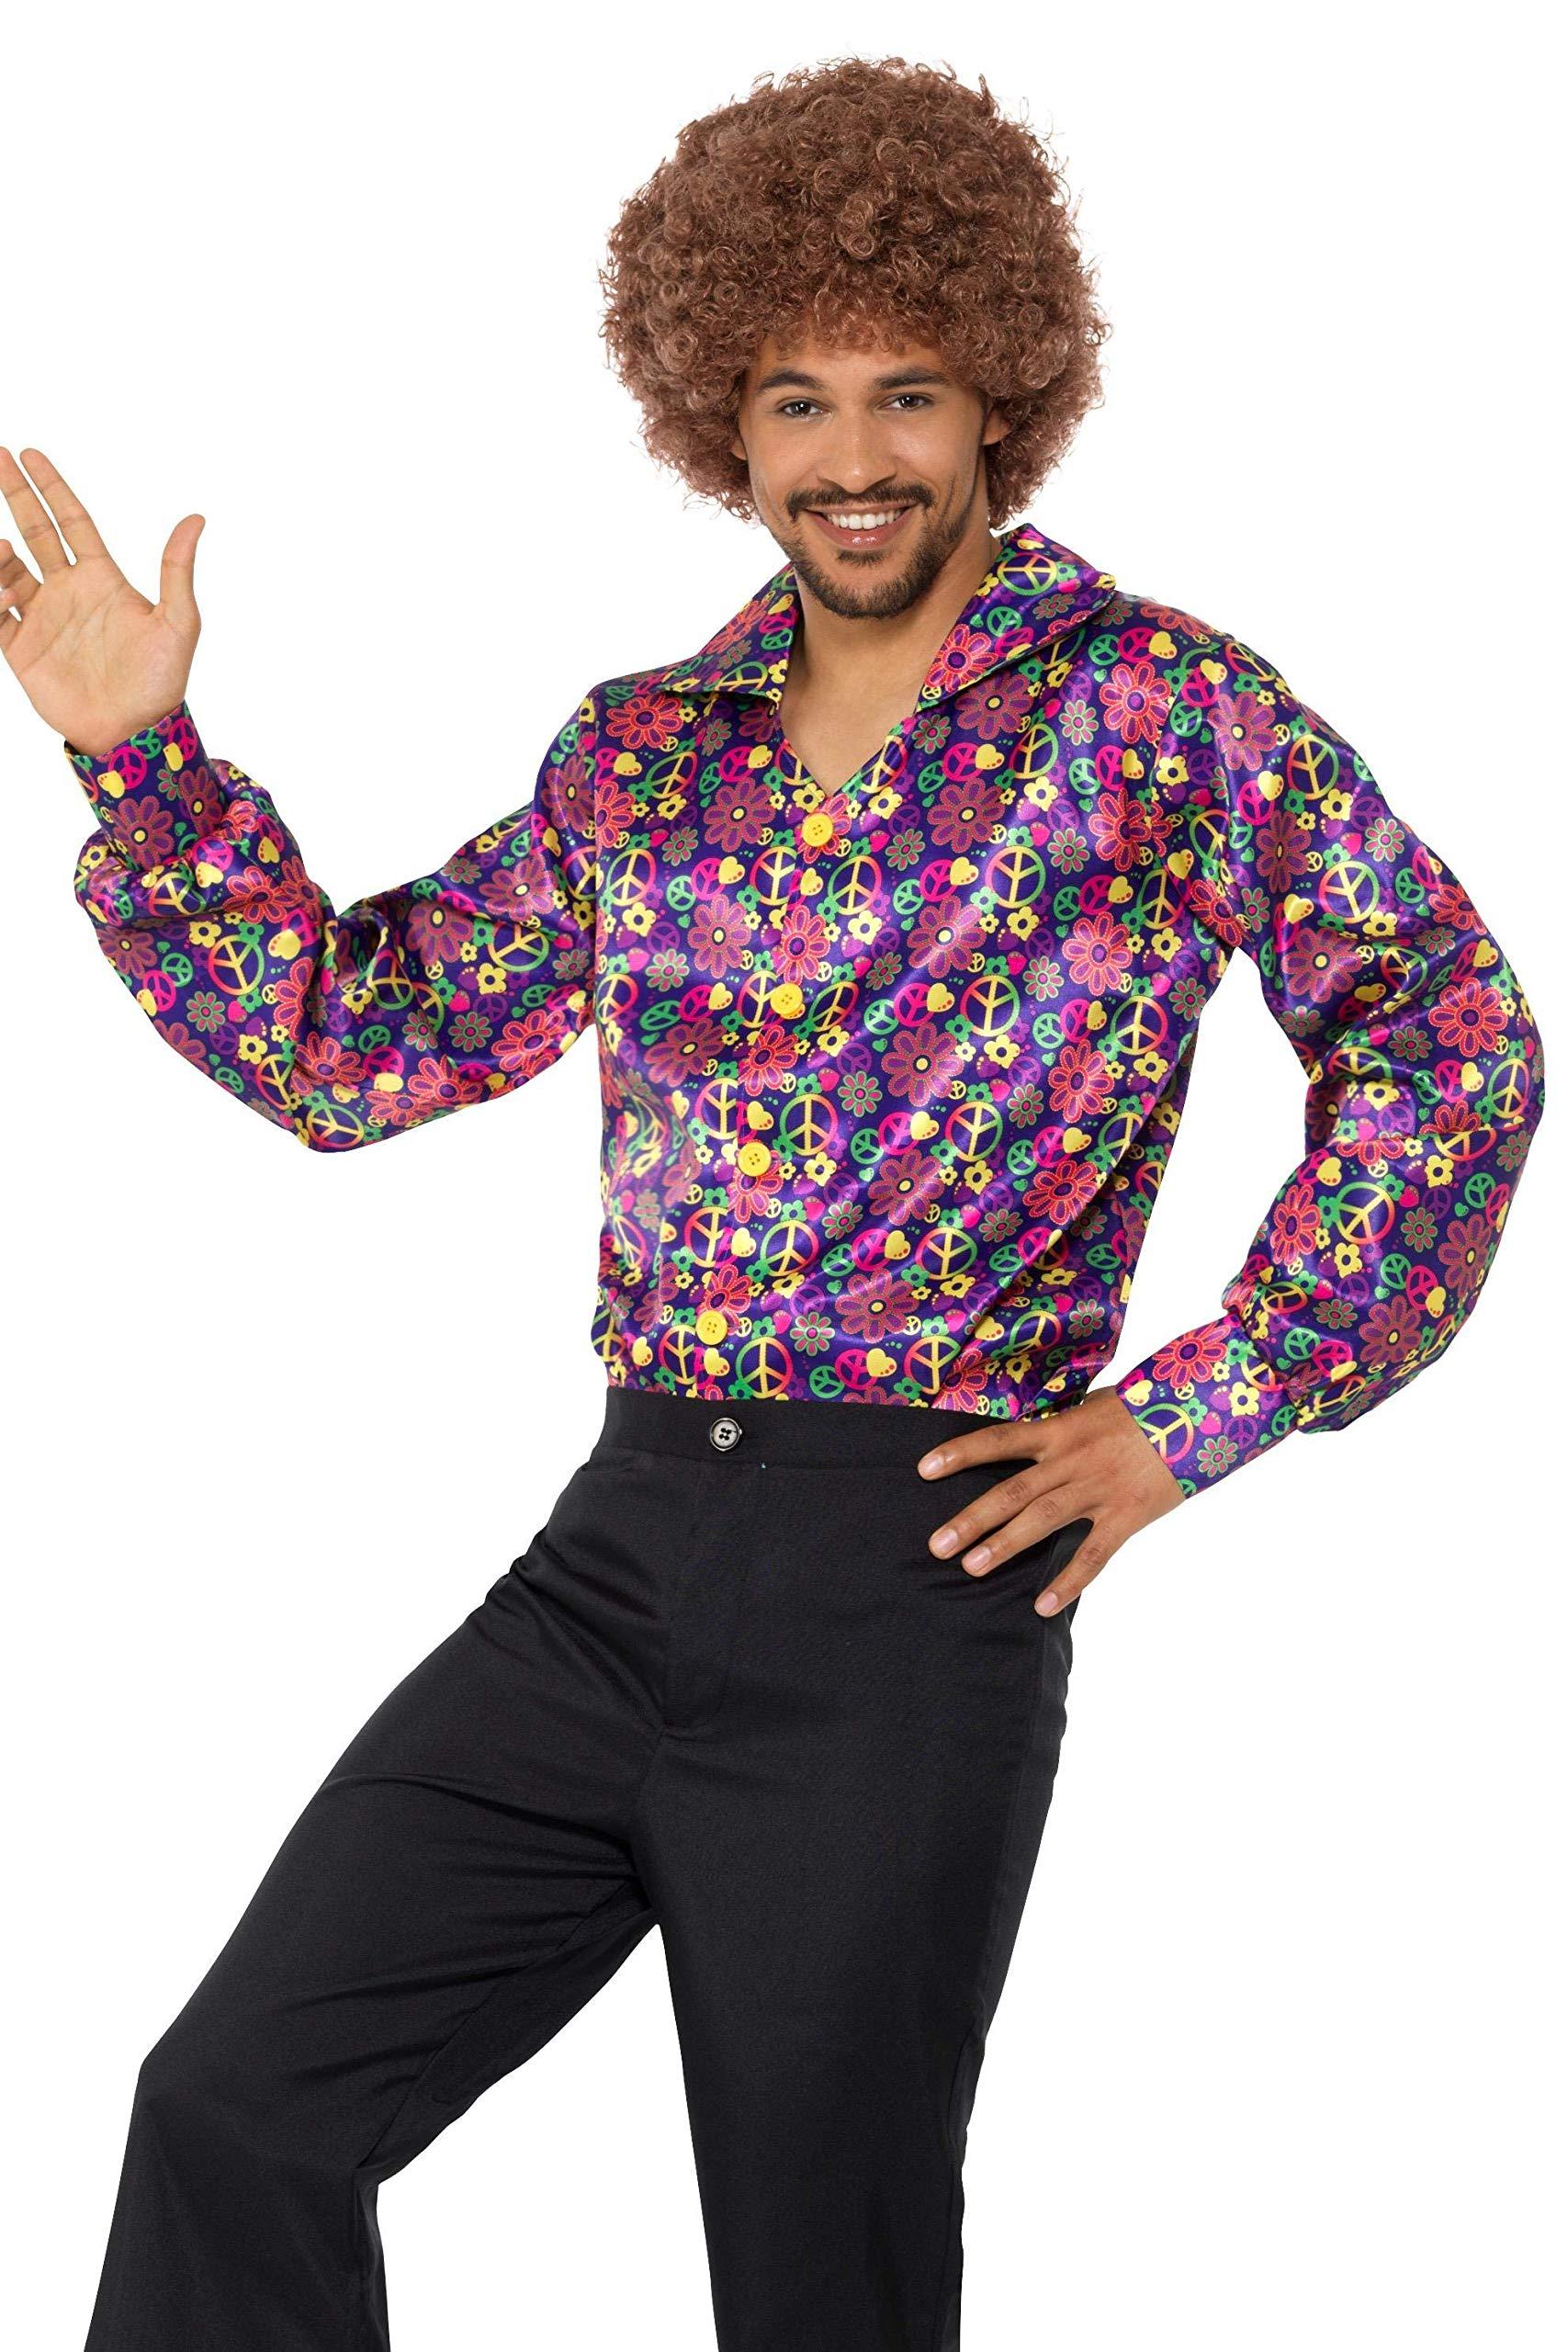 Smiffys Psychedelic Shirt 60s-Camiseta psicodélica CND, Multicolor, L-Size 42